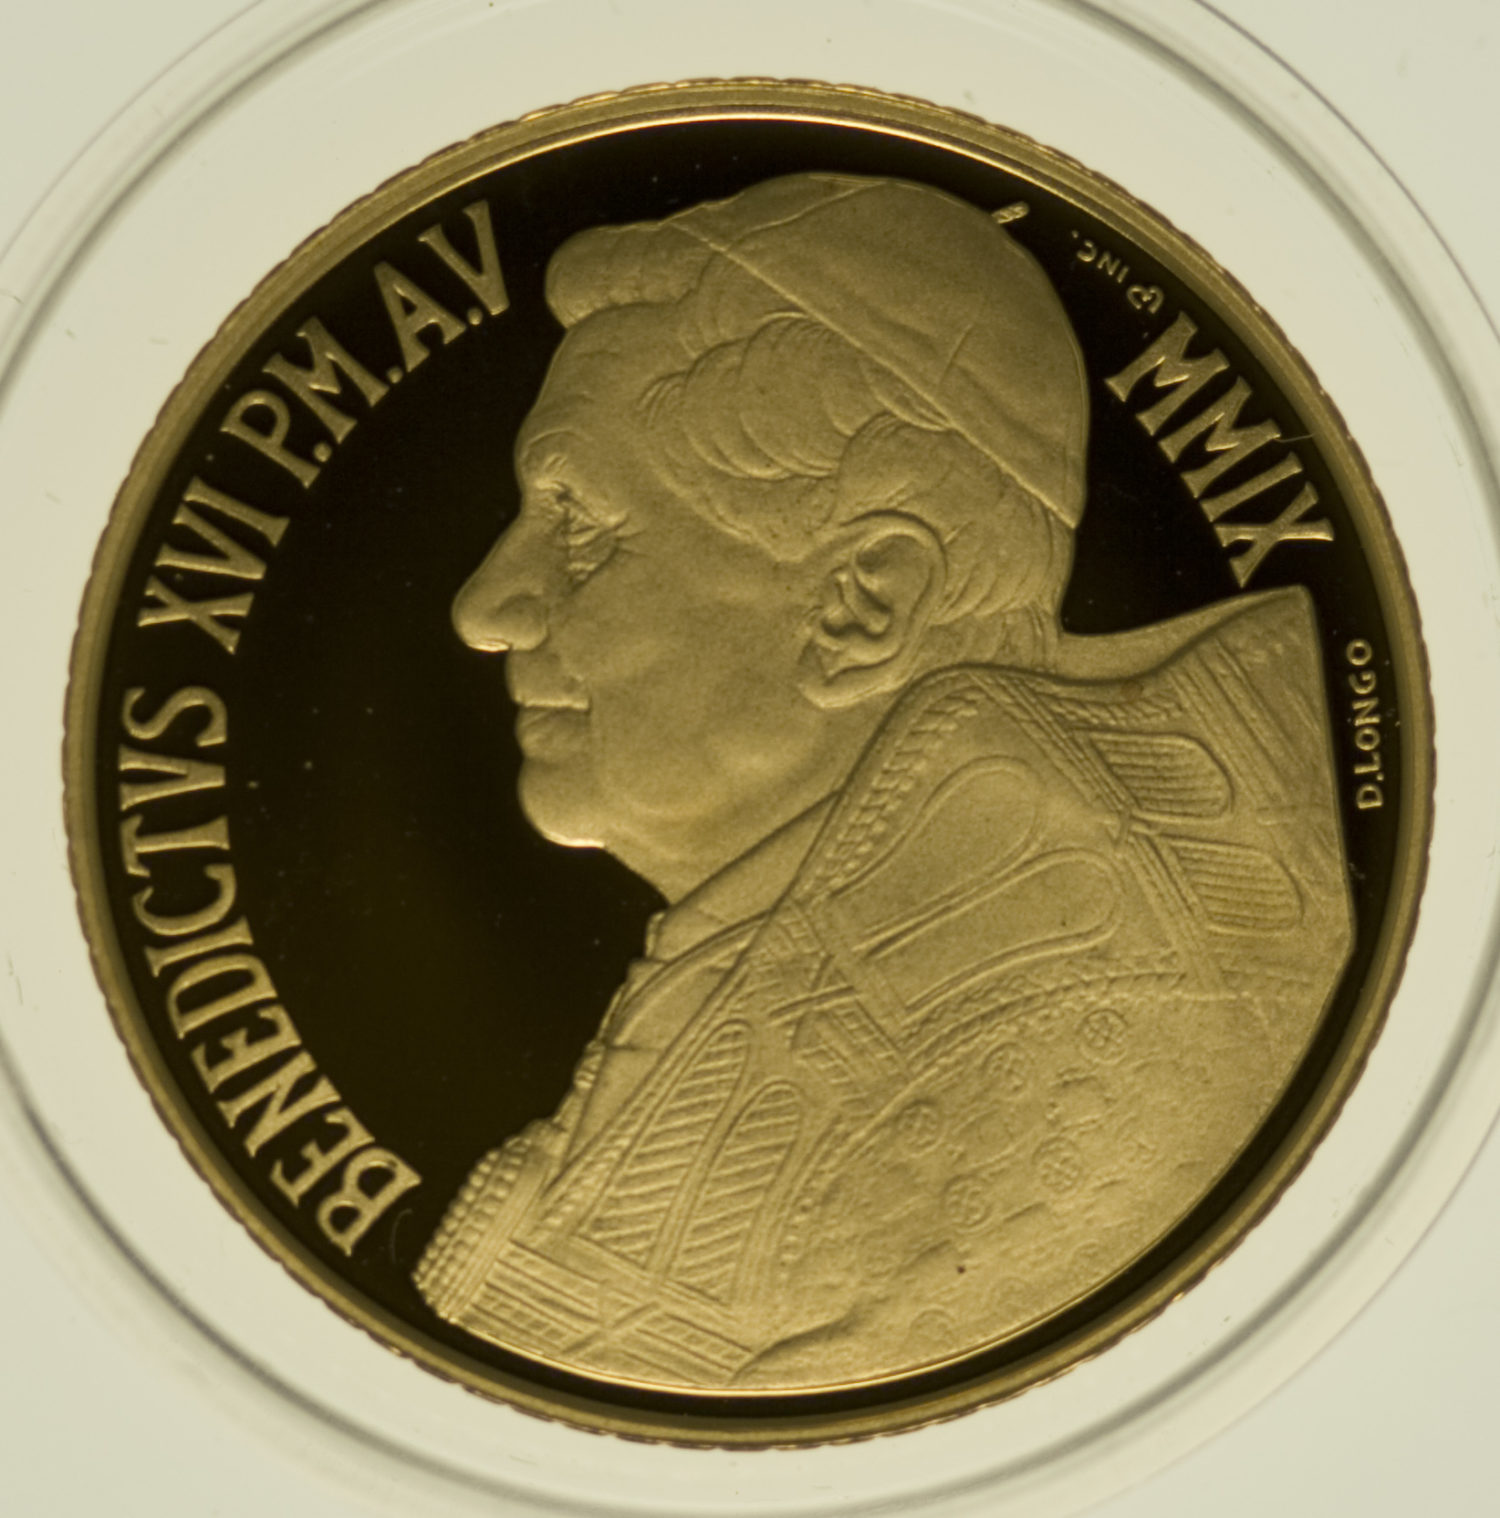 vatikan - Vatikan Benedikt XVI. 20 Euro 2009